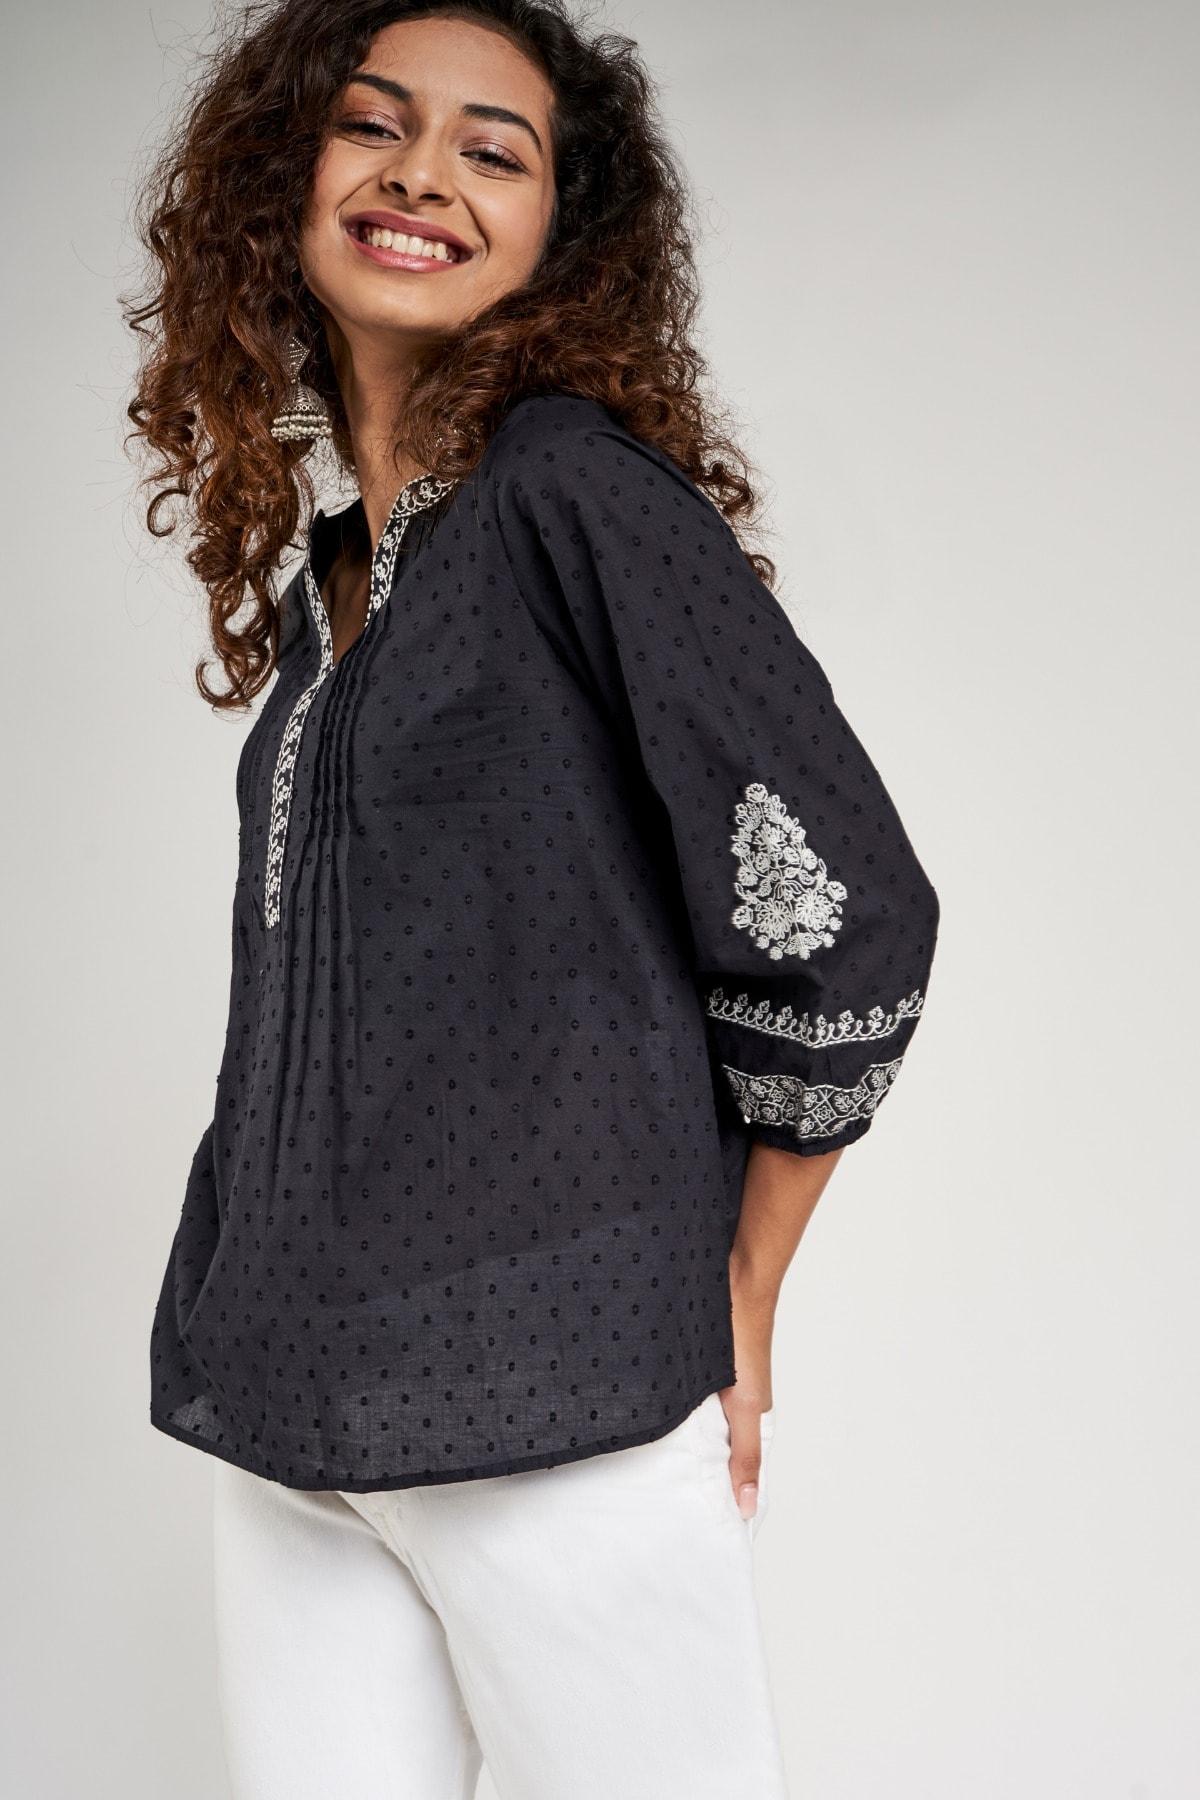 Global Desi | Black Self Design Embroidered A-Line Top